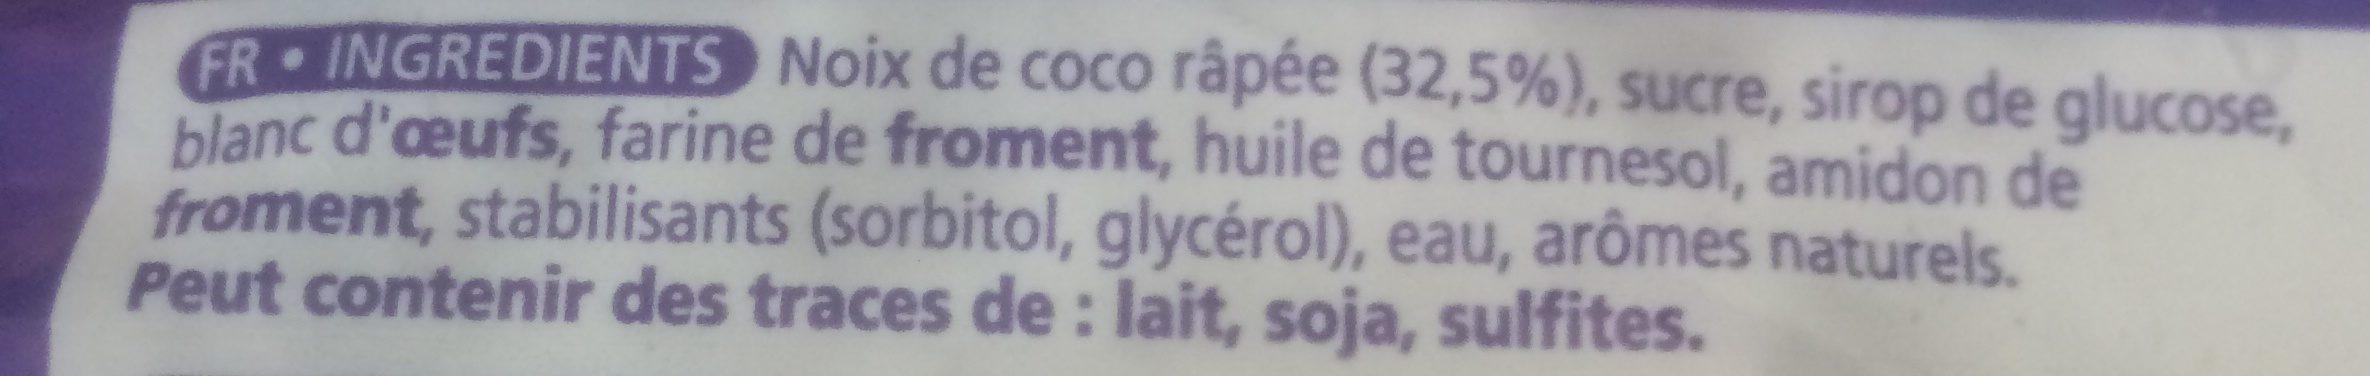 Mini Rochers Coco Serebis, - Ingrédients